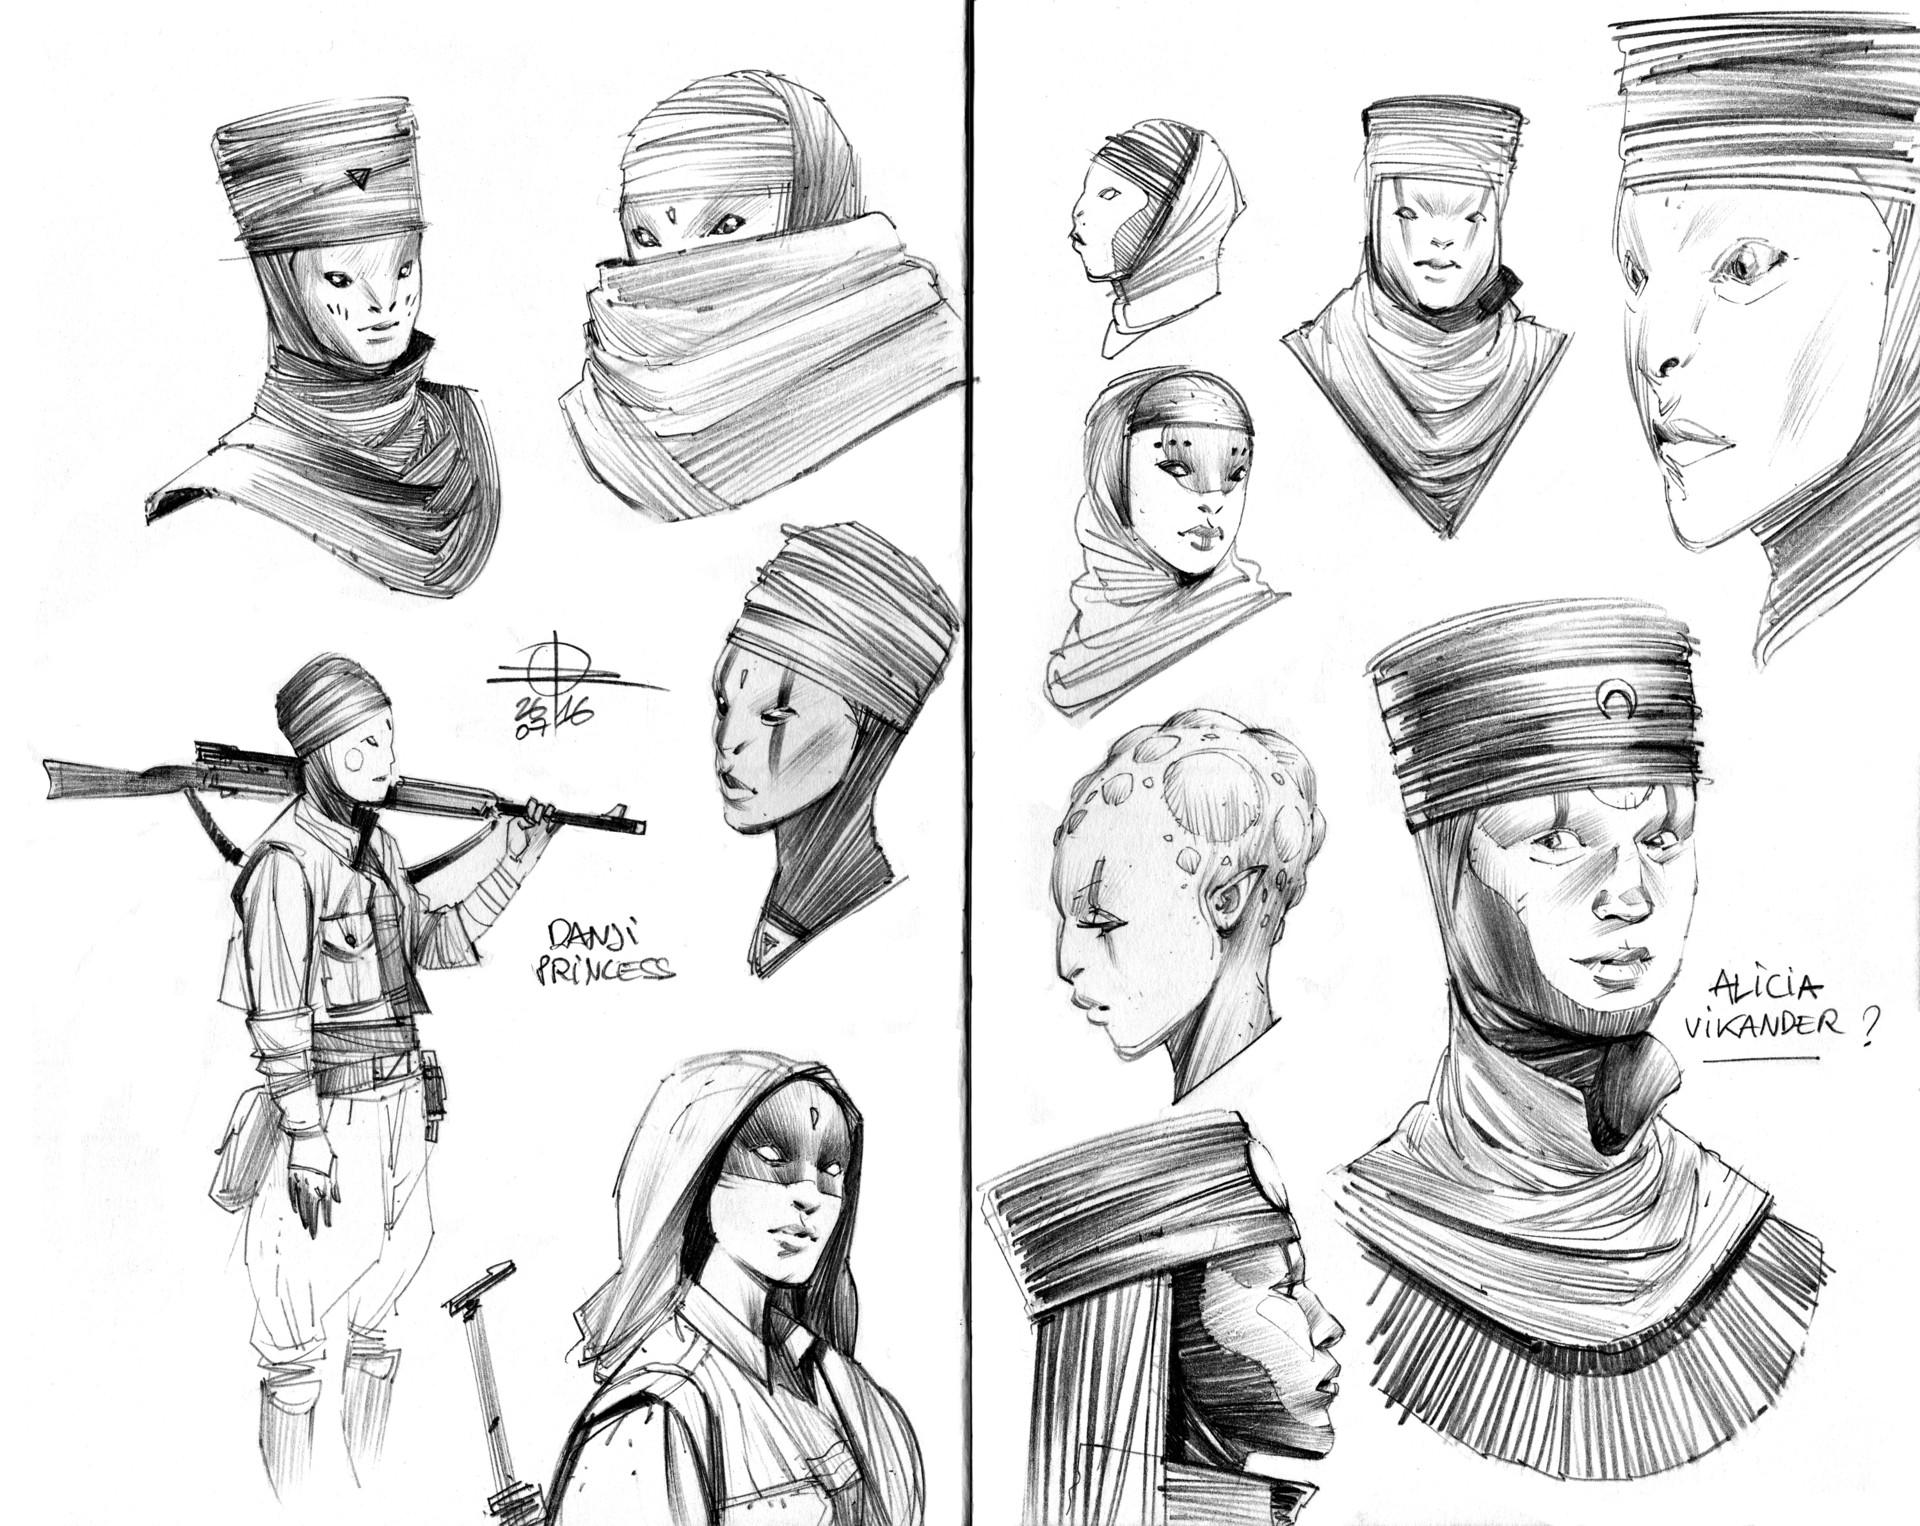 Renaud roche part05 sketches01b